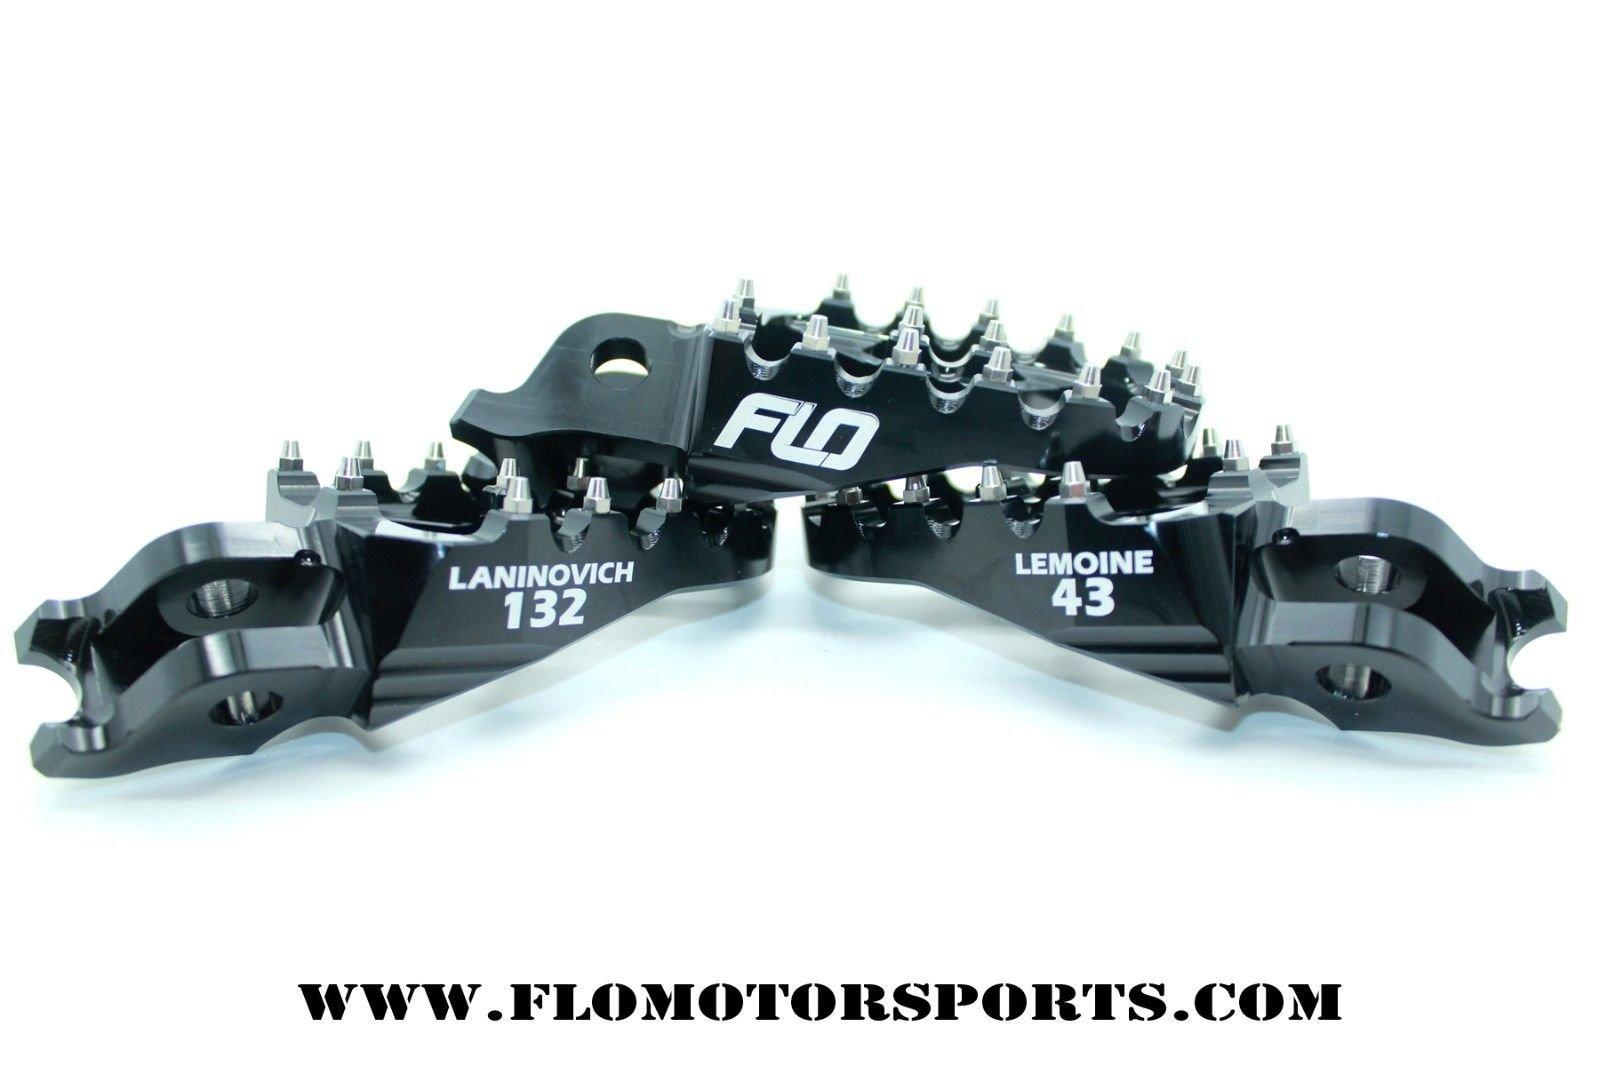 Flo Motorsports Black Kawasaki Kx65/80/85/100 Foot Pegs Fpeg-797blk by Flo Motorsports (Image #7)